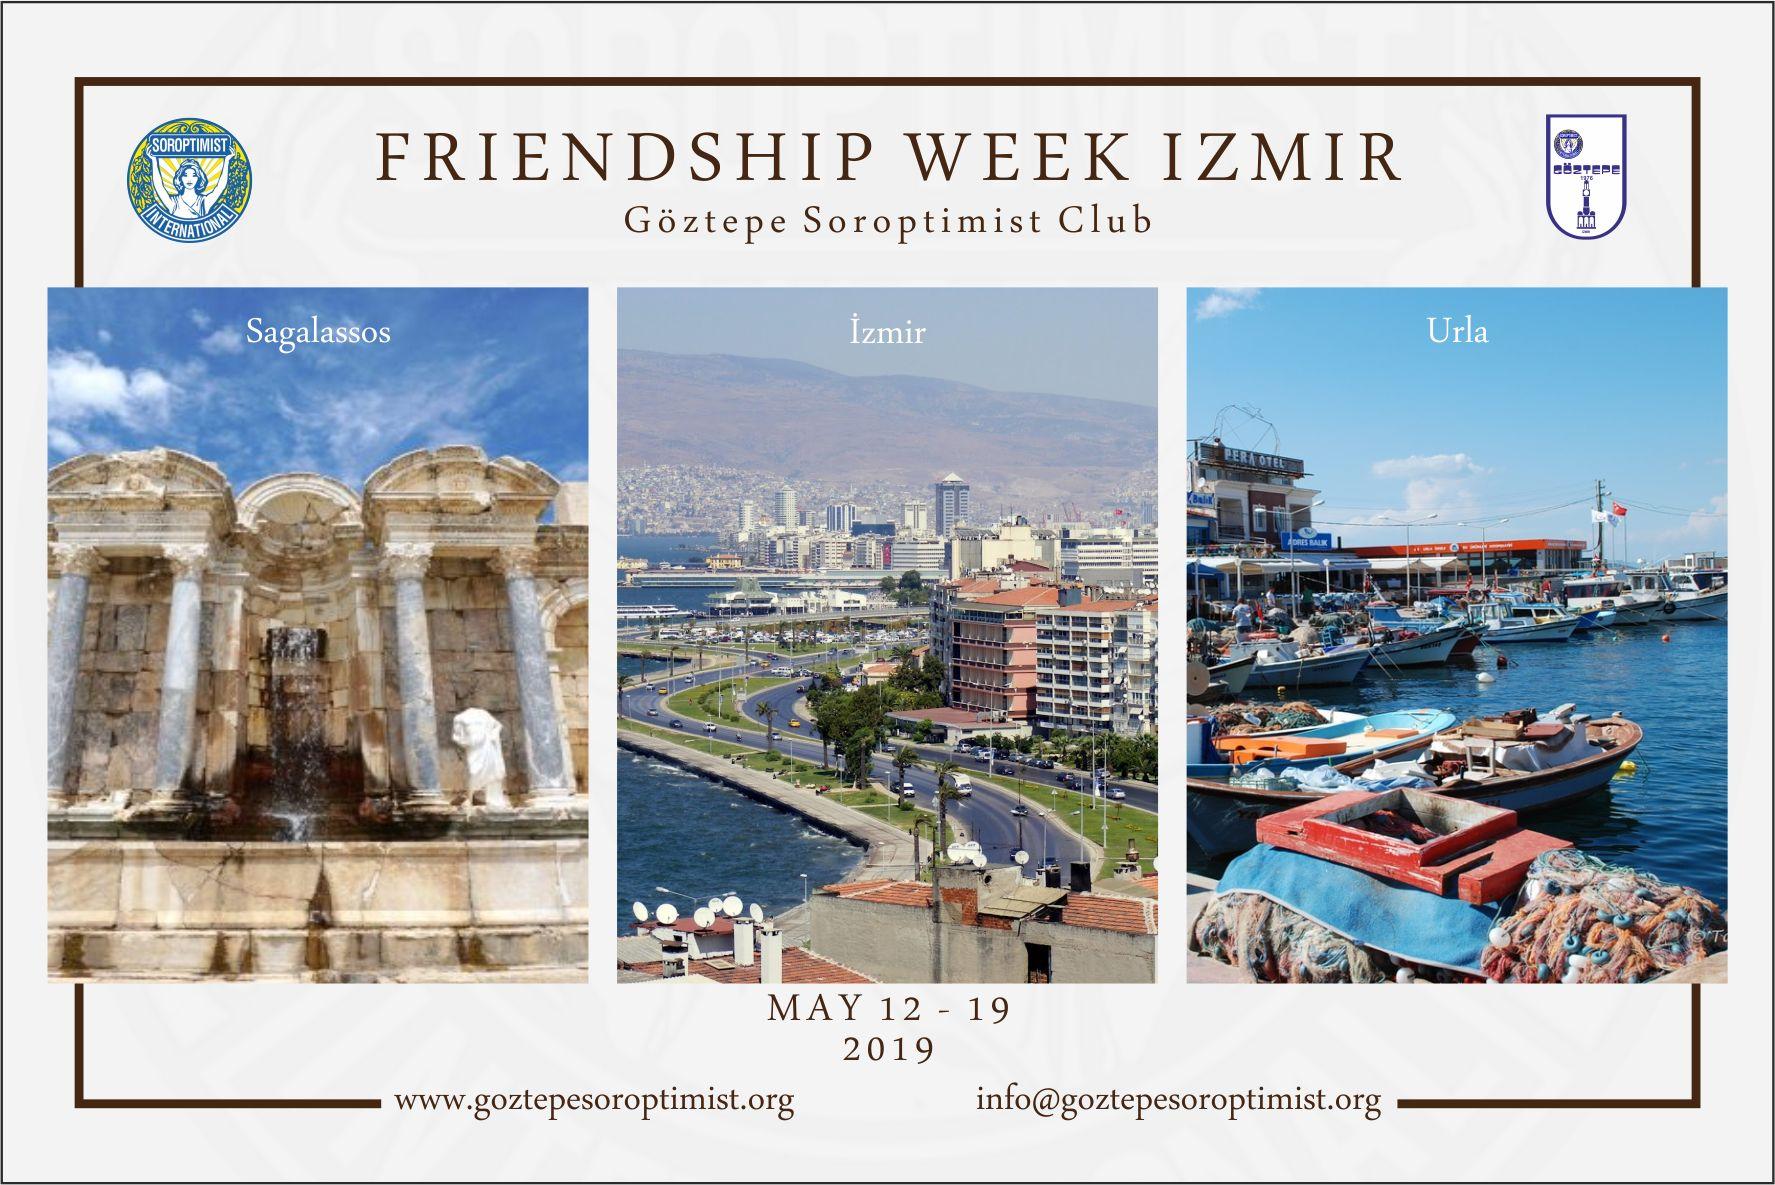 FRIENDSHIP WEEK 1